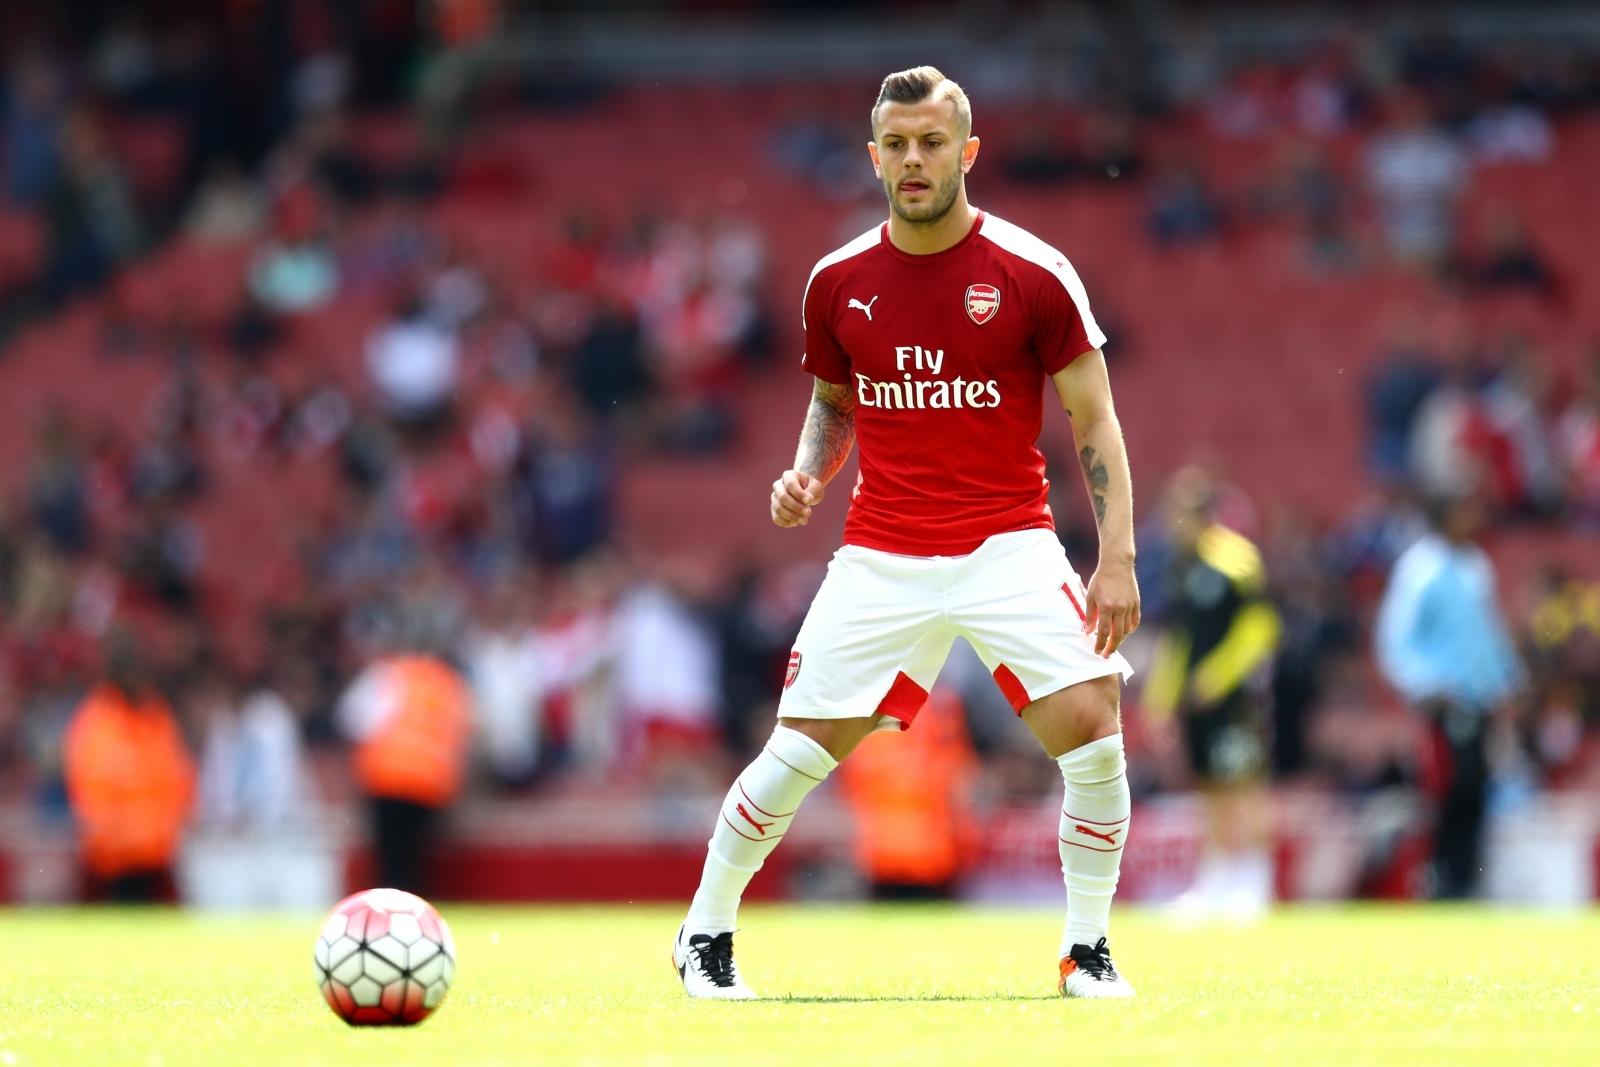 West Ham consider deadline day loan move for Arsenal midfielder